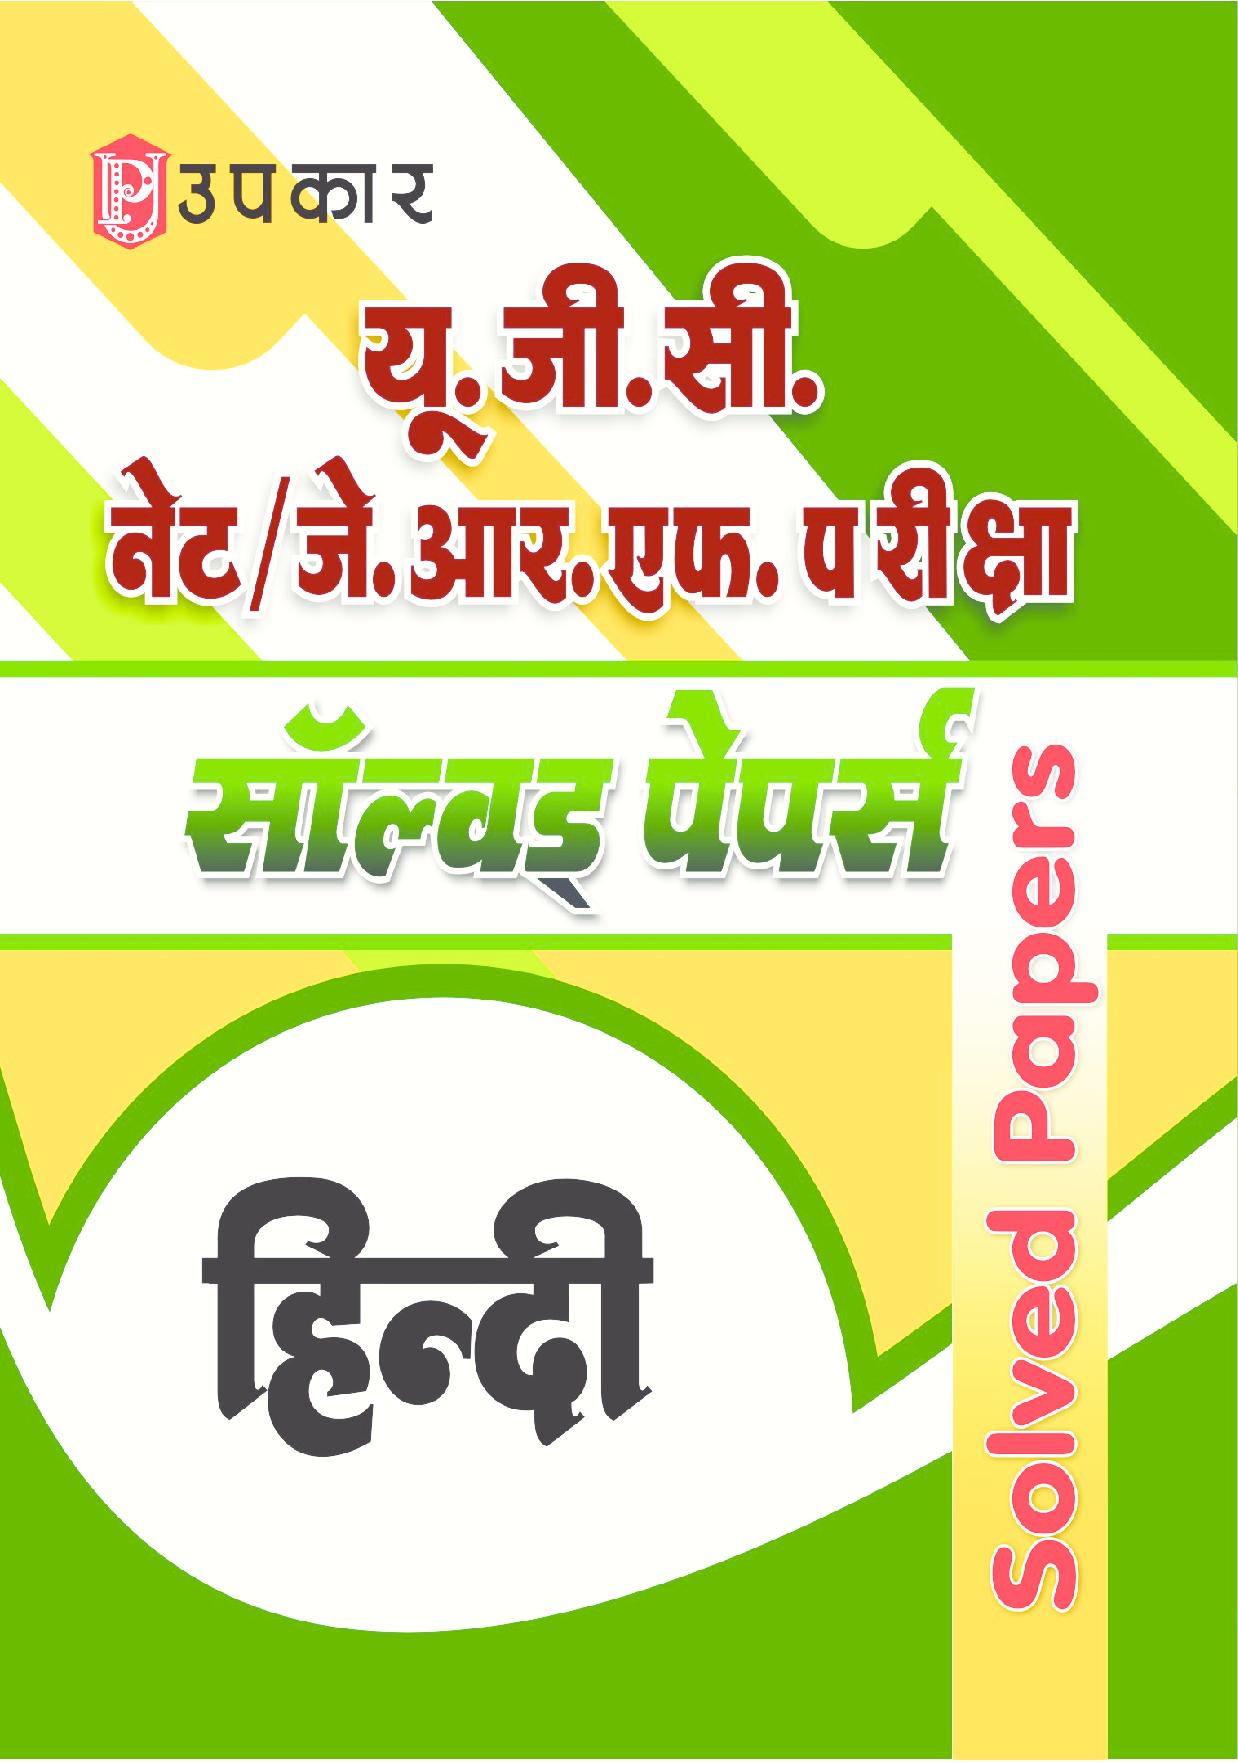 U.G.C. NET/J.R.F. परीक्षा साल्व्ड पेपर हिंदी   - Page 1